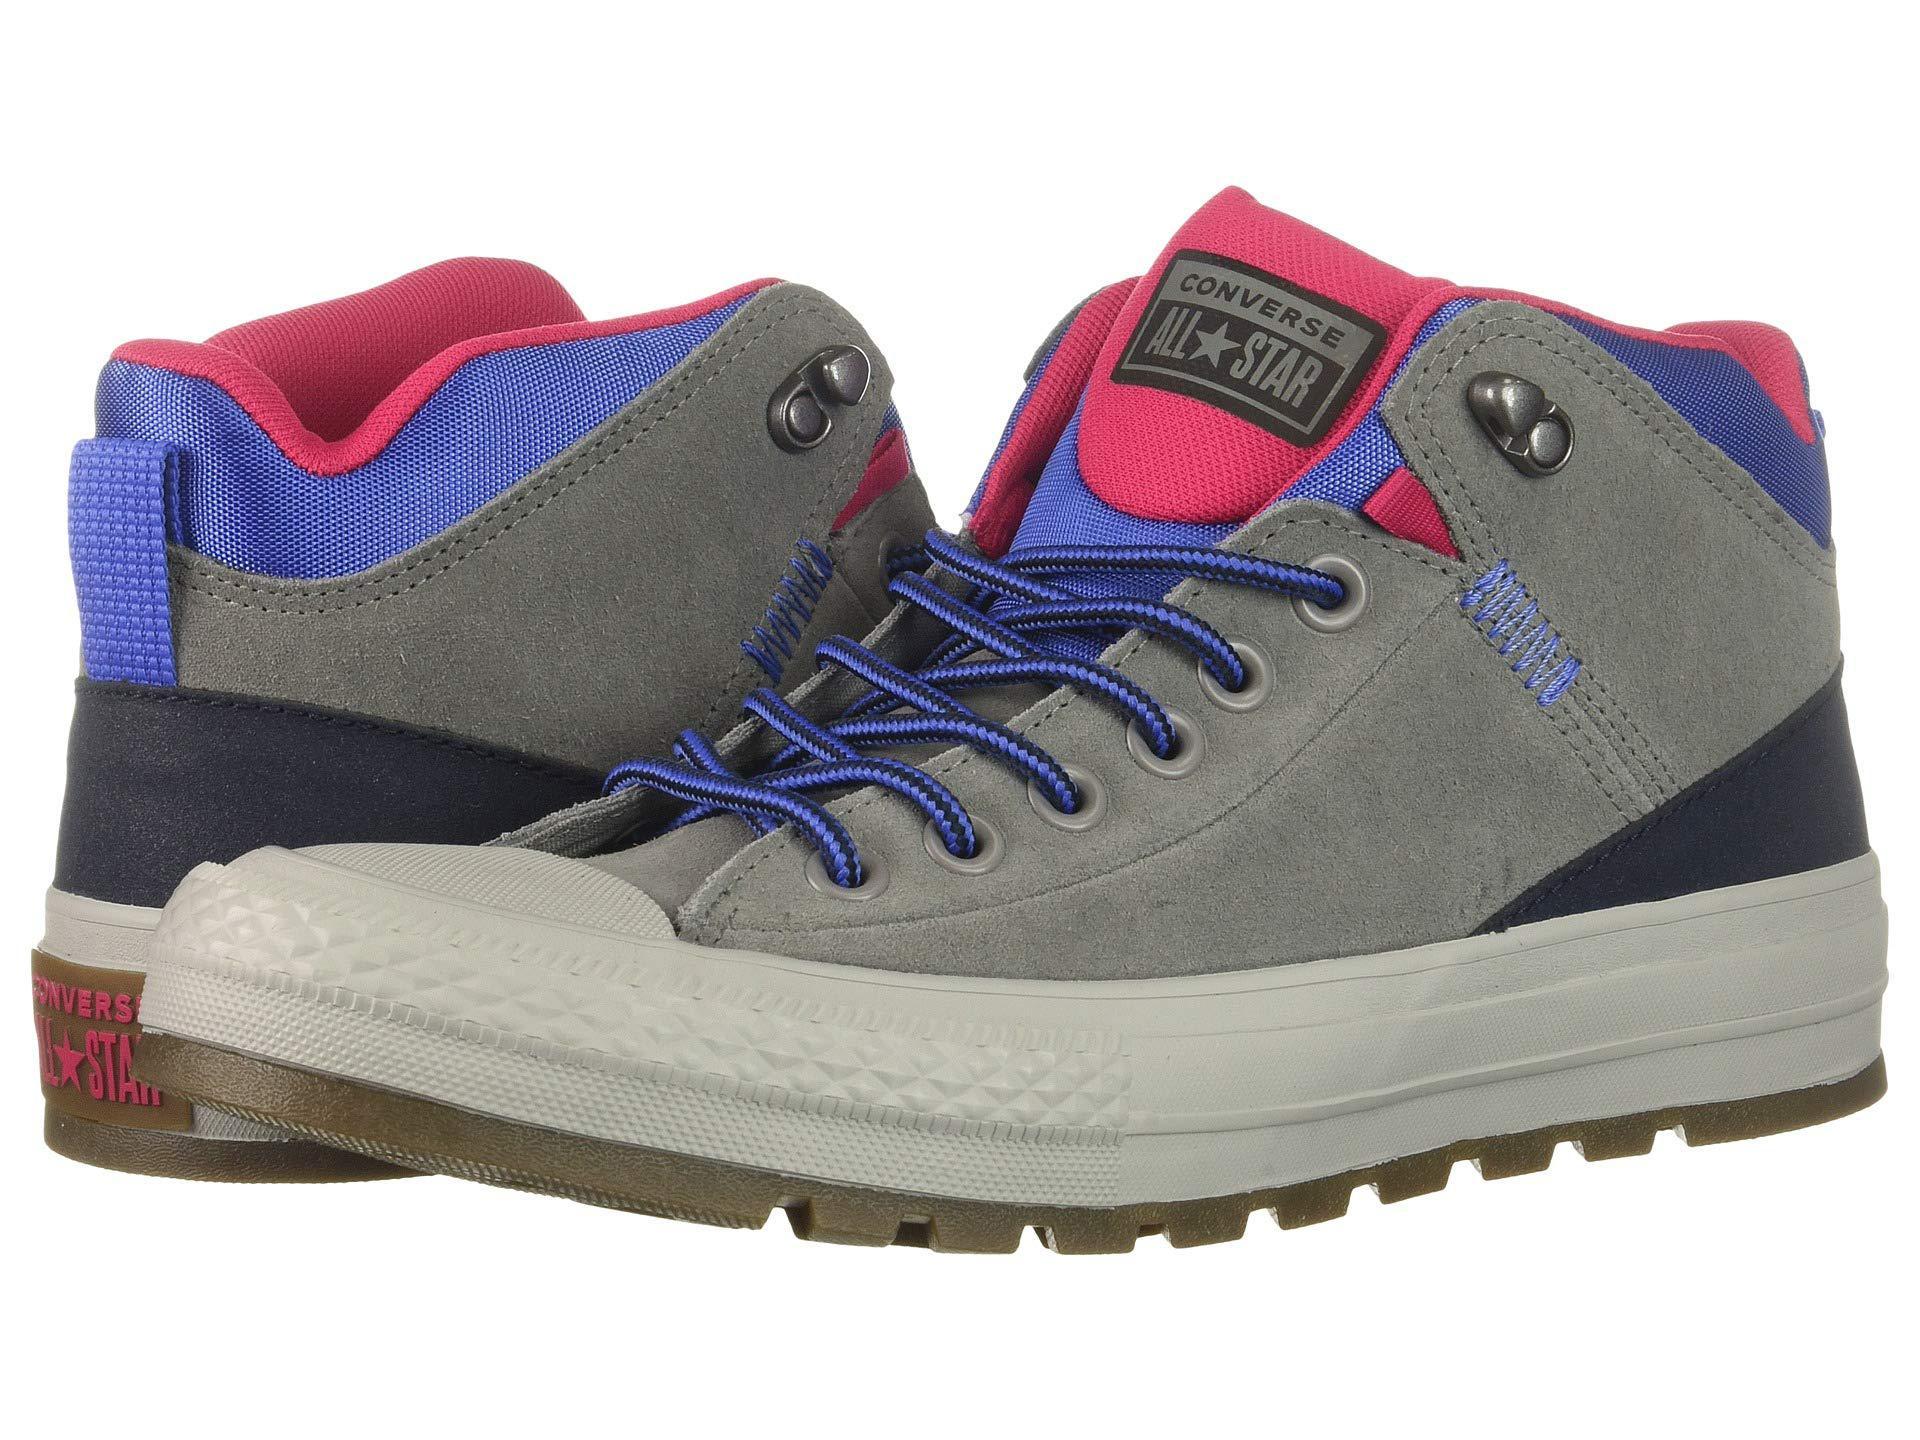 4fce59d273efca Lyst - Converse Chuck Taylor All Star Street Boot - Hi (mason ...